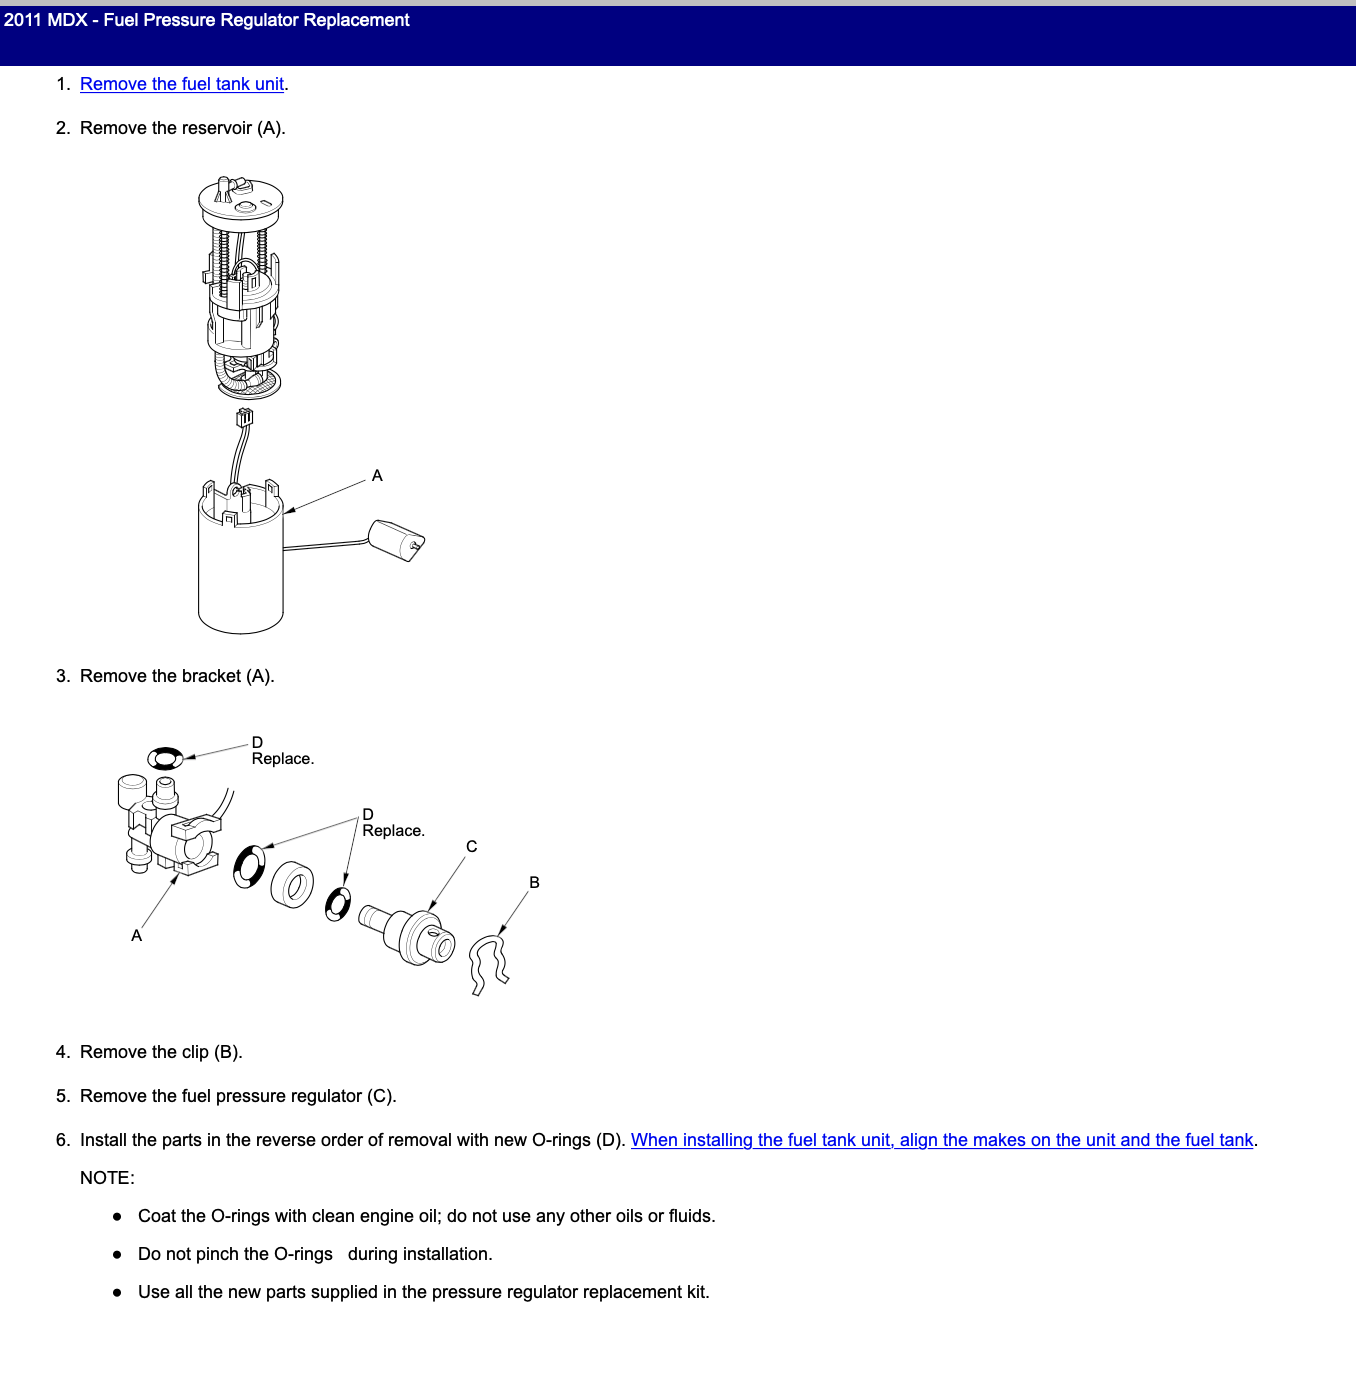 Acura Fuel Pressure Diagram - Stop Light Wiring Diagram For Street -  7gen-nissaan.jeep-jimny.waystar.fr   Acura Fuel Pressure Diagram      Wiring Diagram Resource